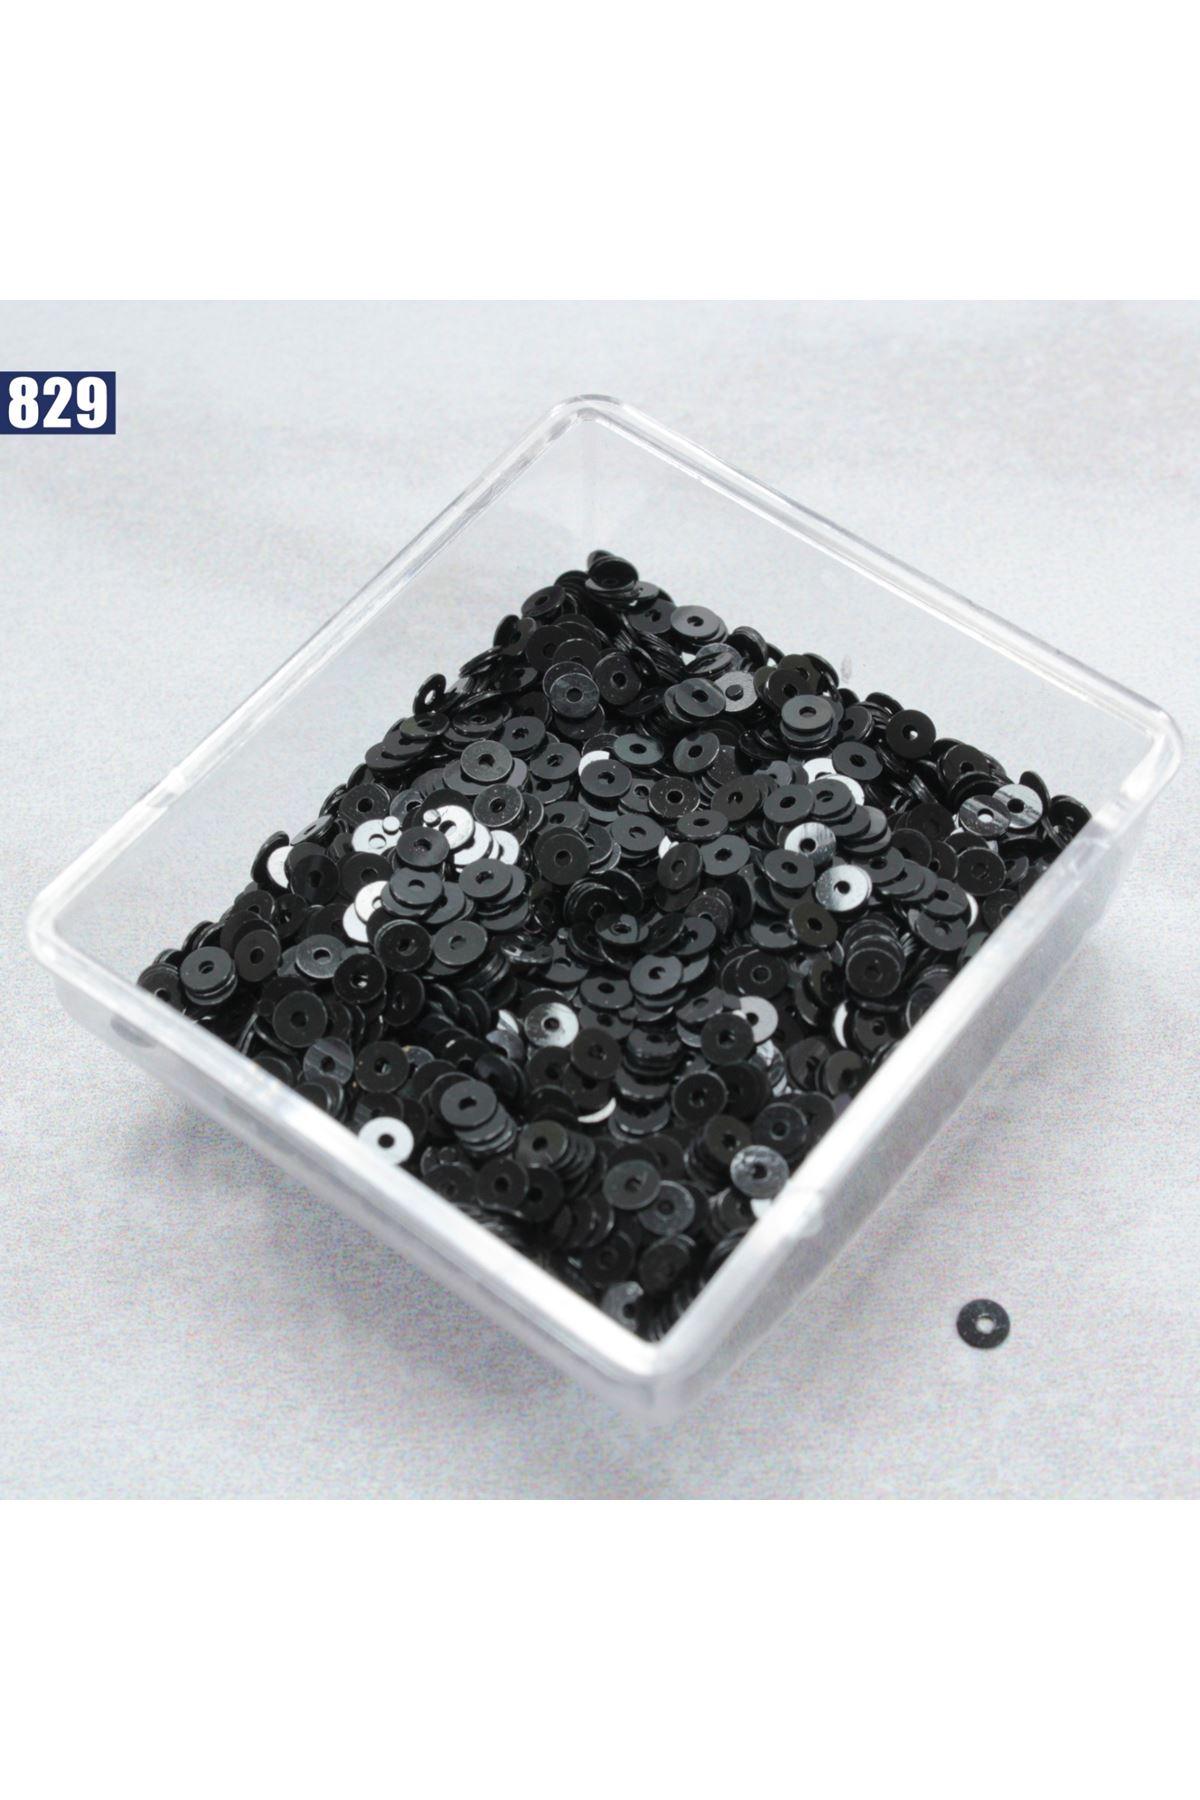 Pul 10 gram - 829